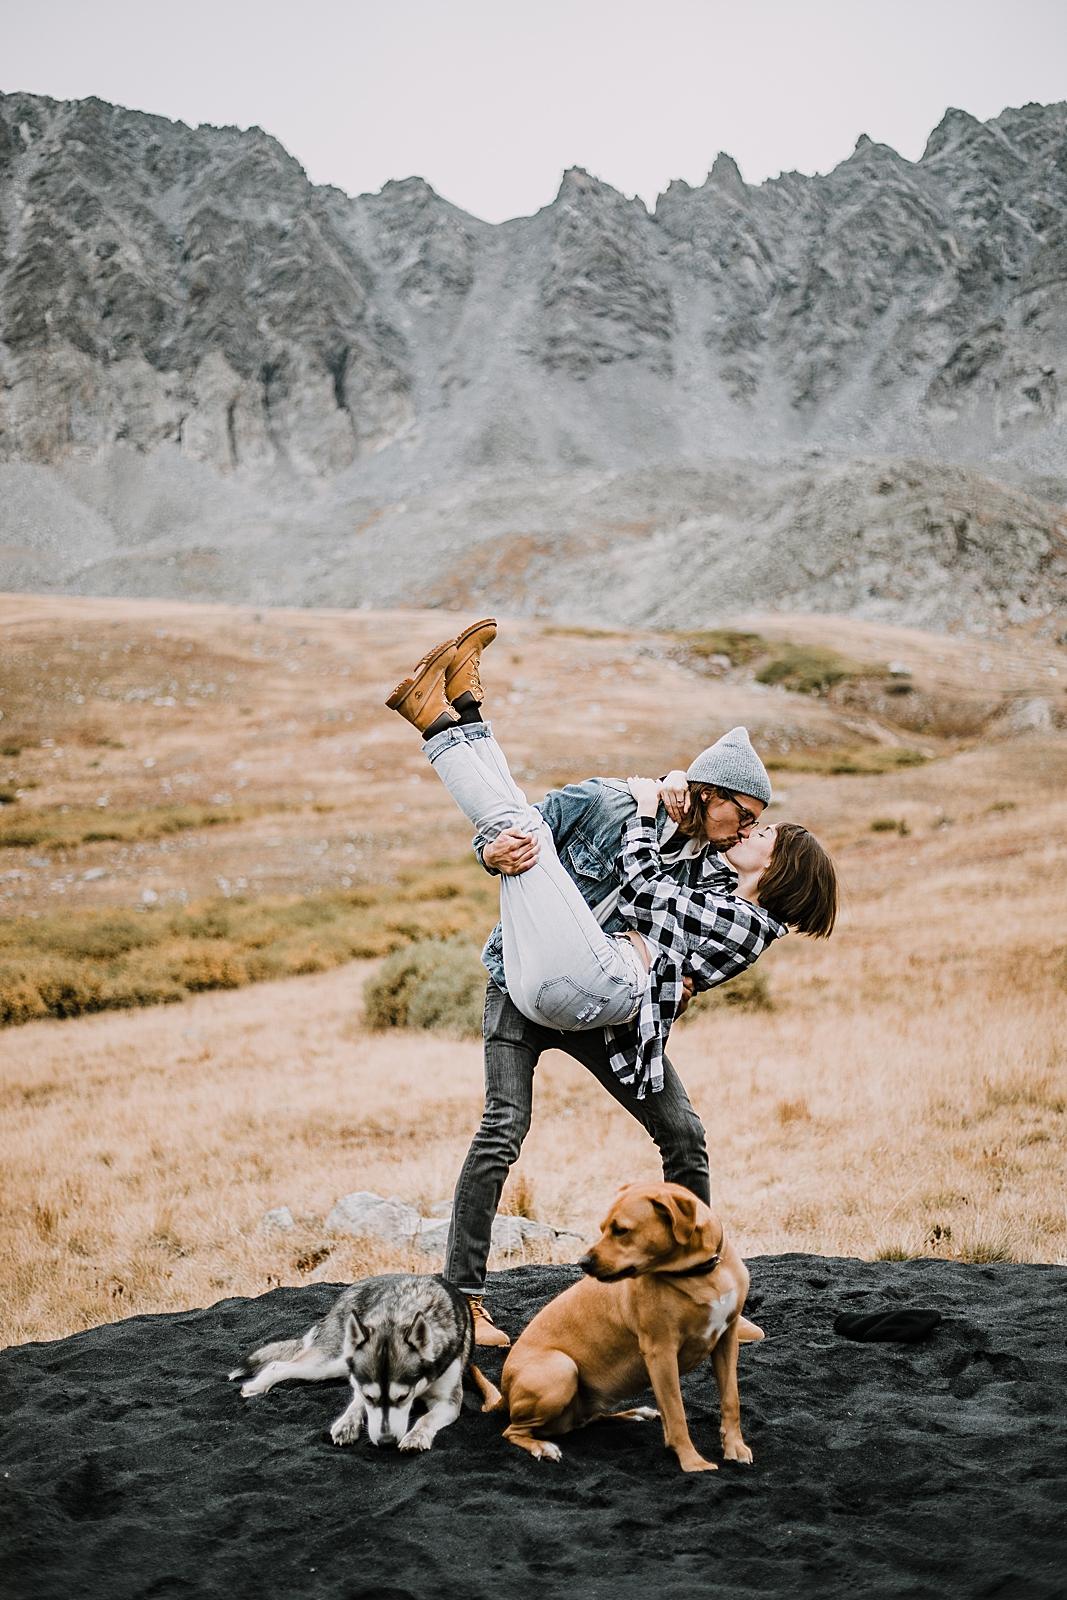 mountain pups, hiking dogs, hike mayflower gulch, mayflower gulch proposal, mayflower gulch elopement, mayflower gulch wedding, colorado 14er, colorado fourteener, leadville elopement